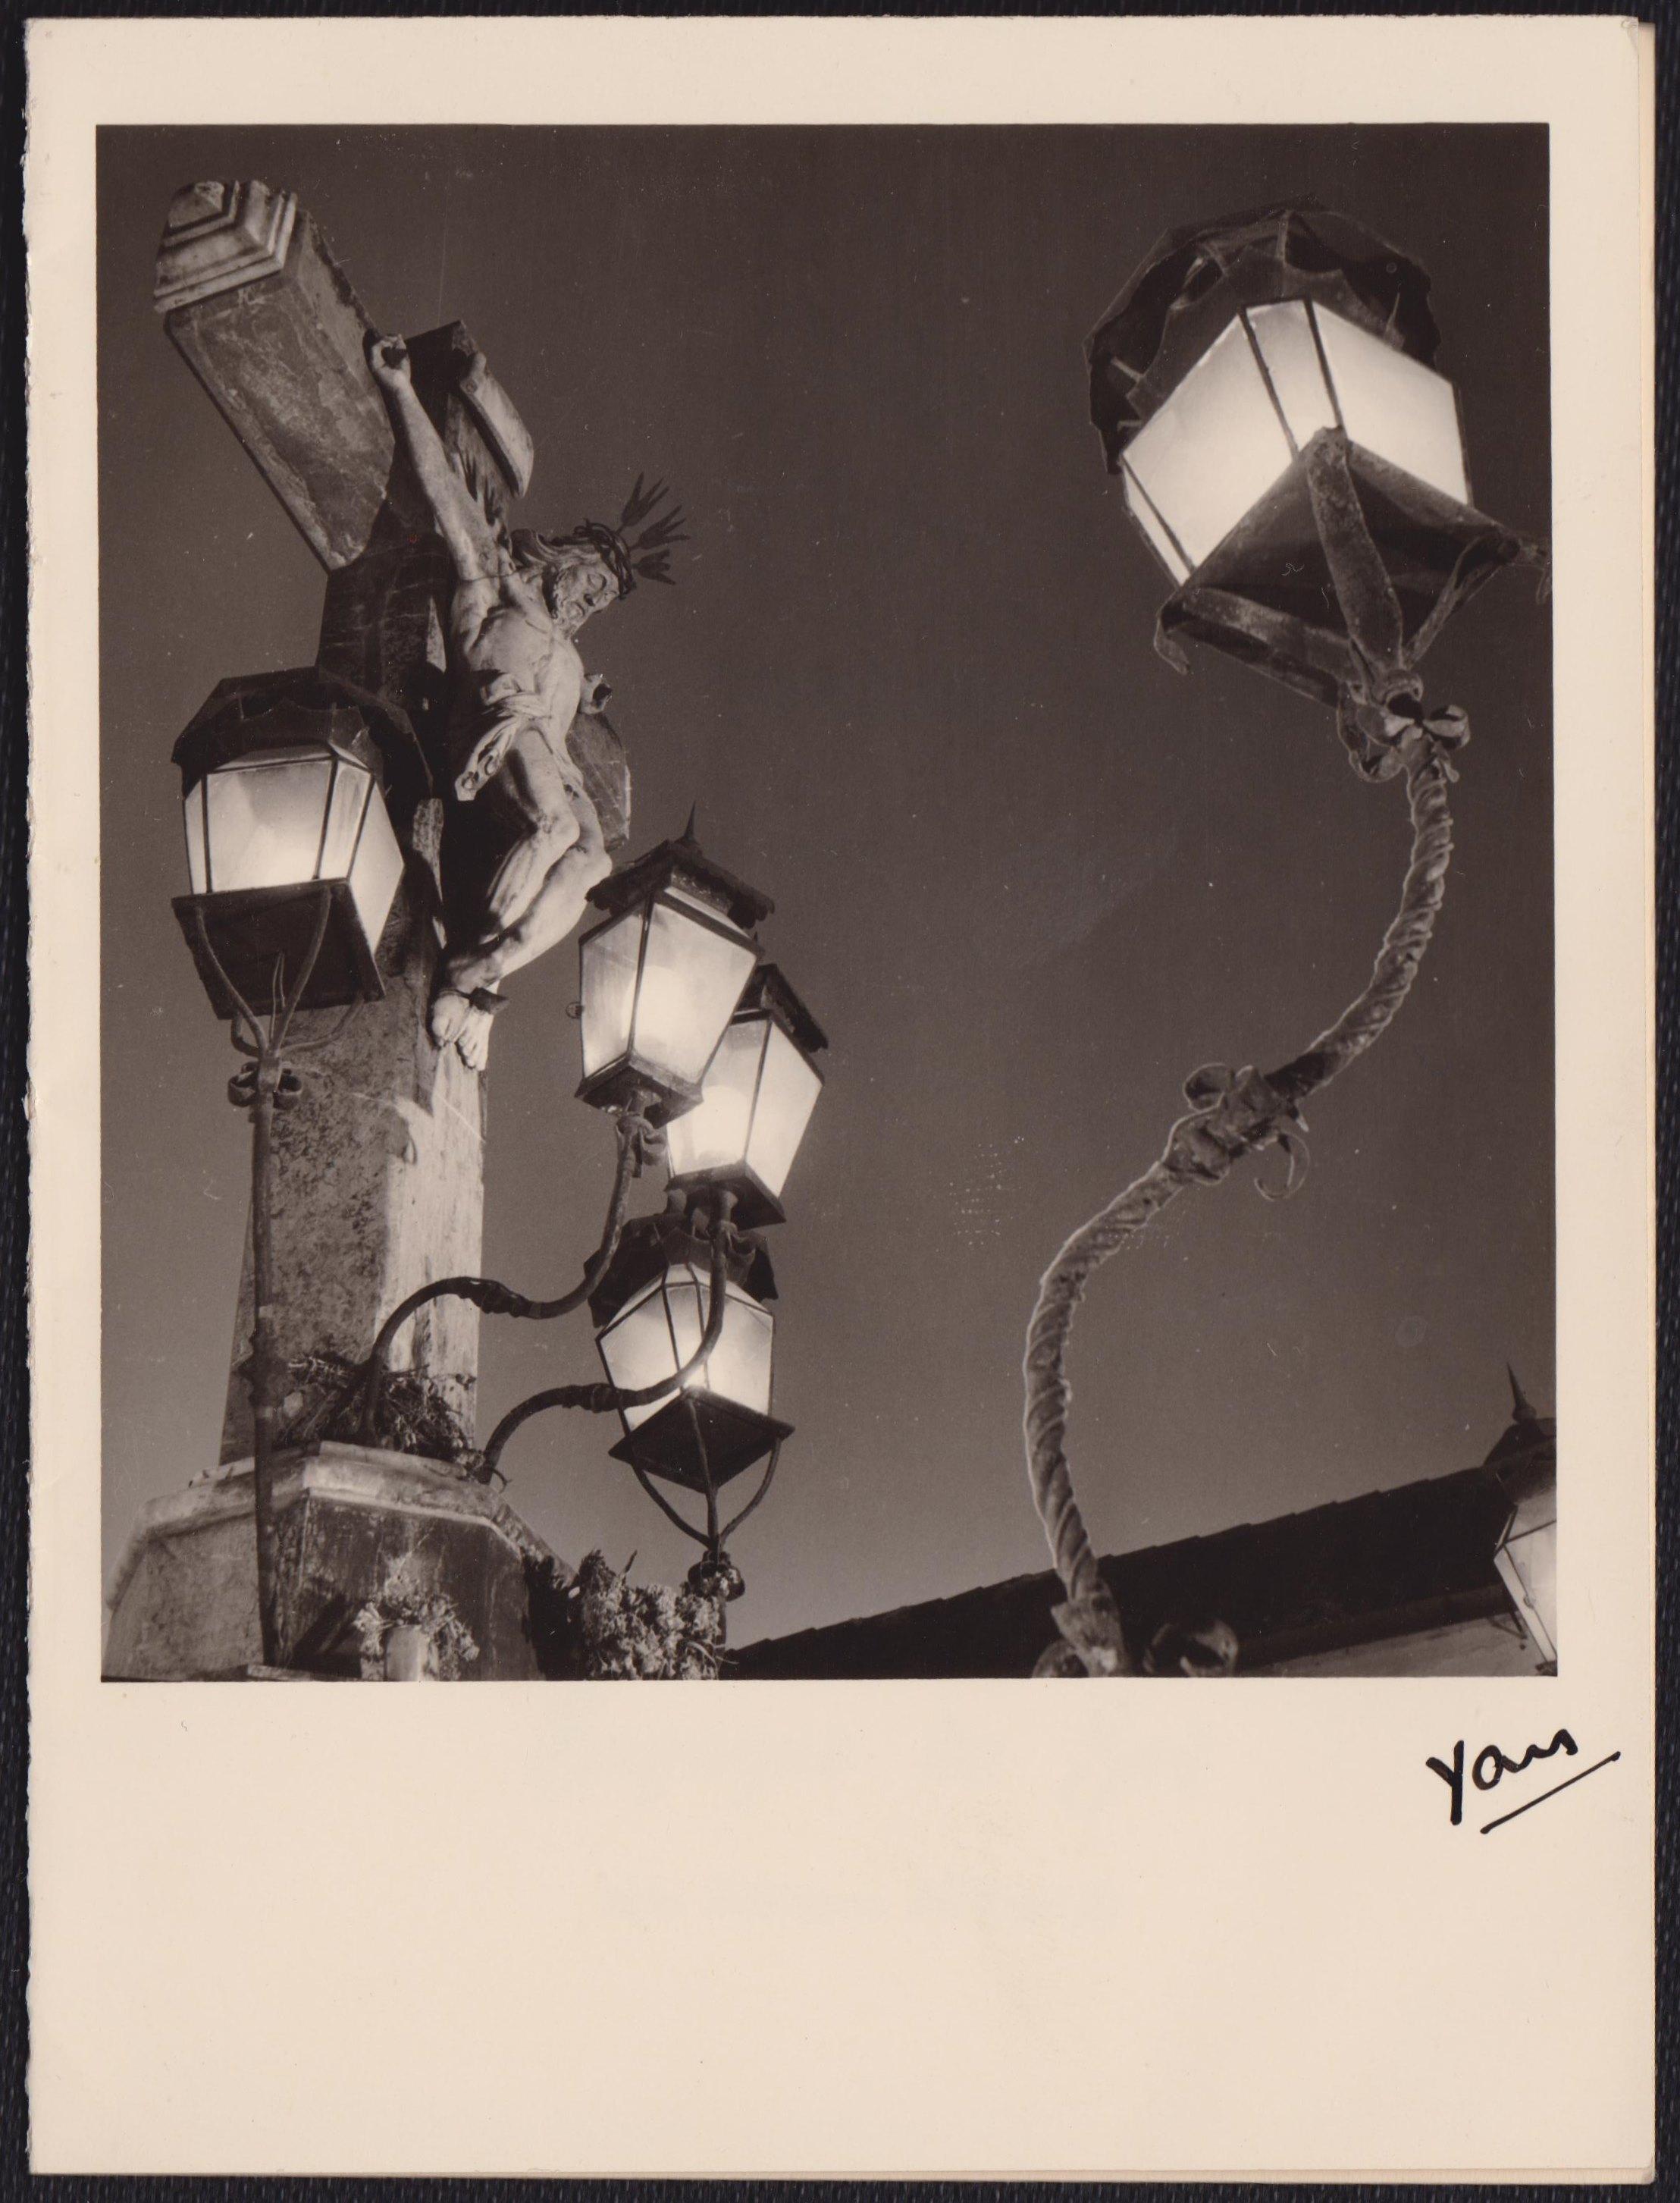 JEAN DIEUZAIDE, Andalousie (1953).